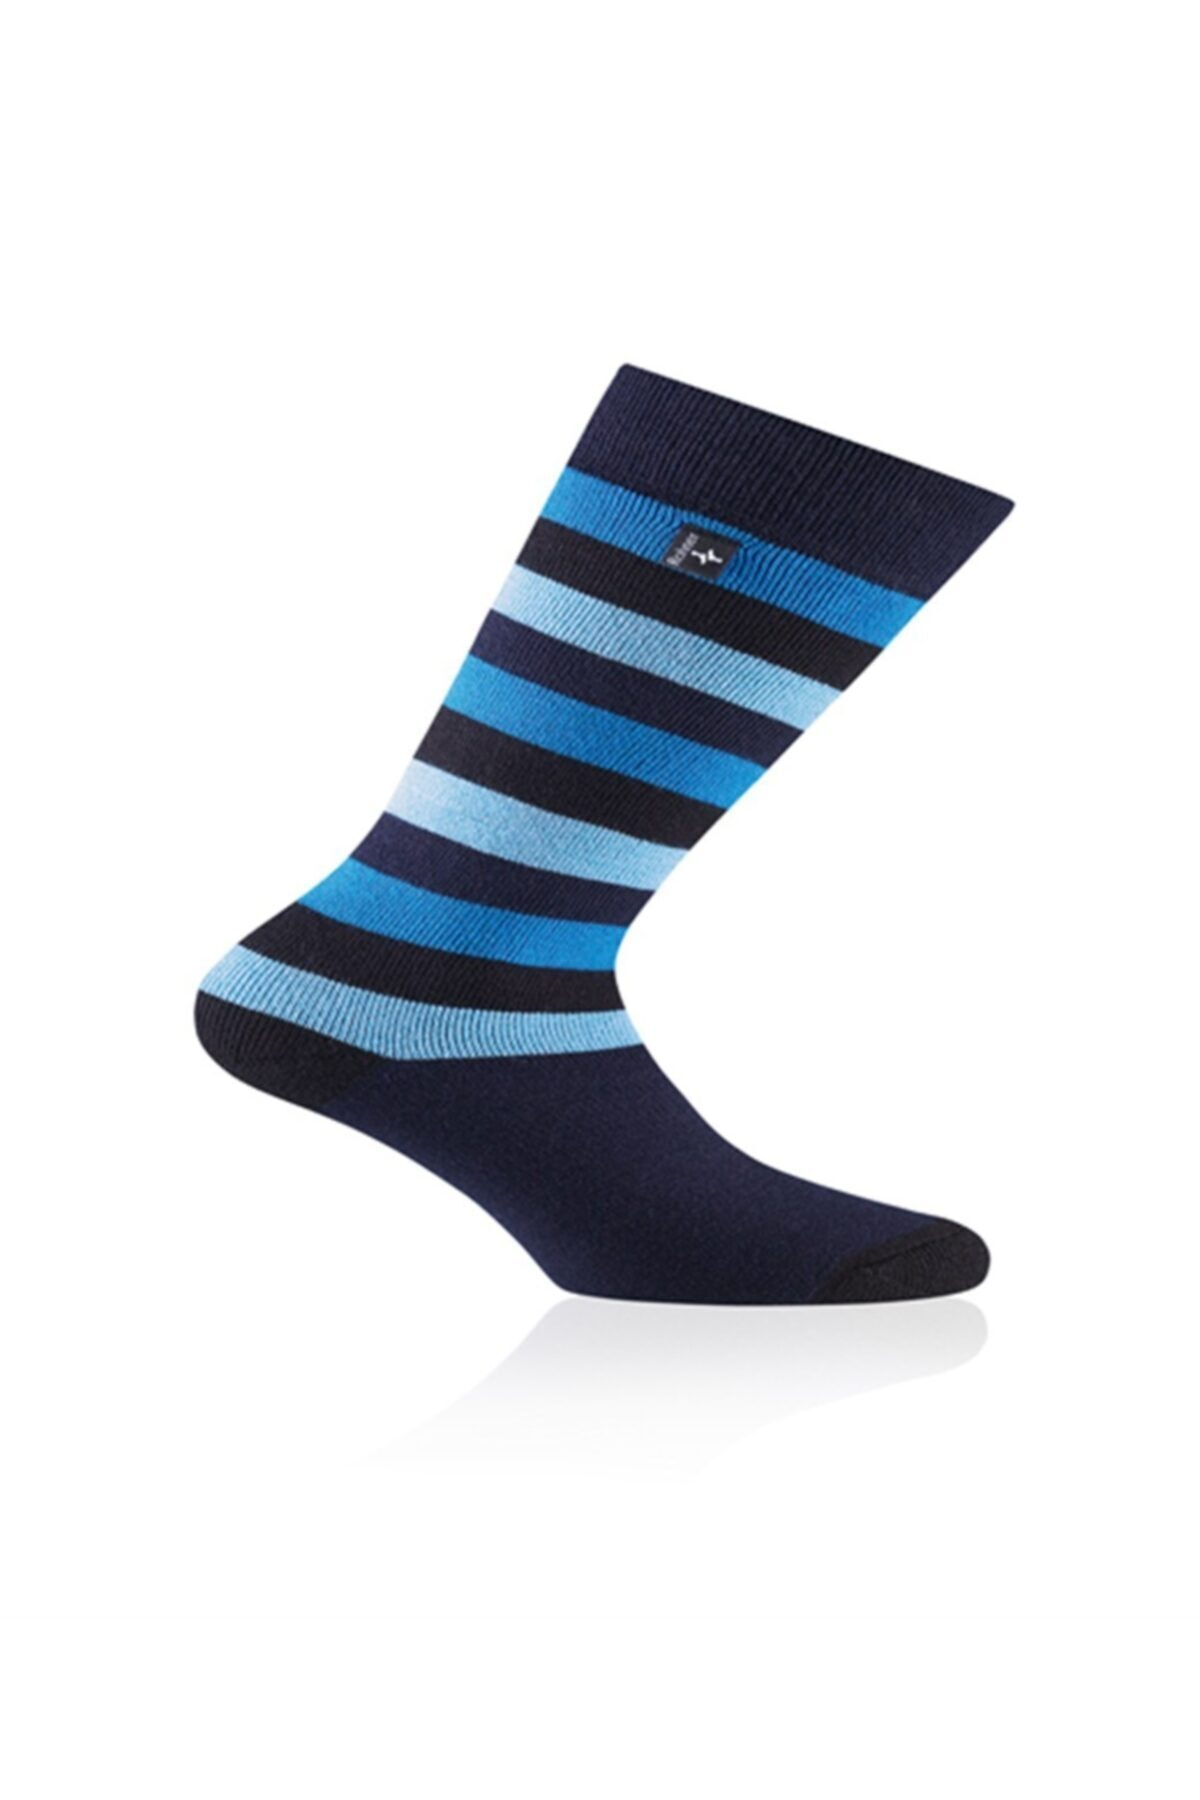 Rohner Strıpes Skı Socks 1